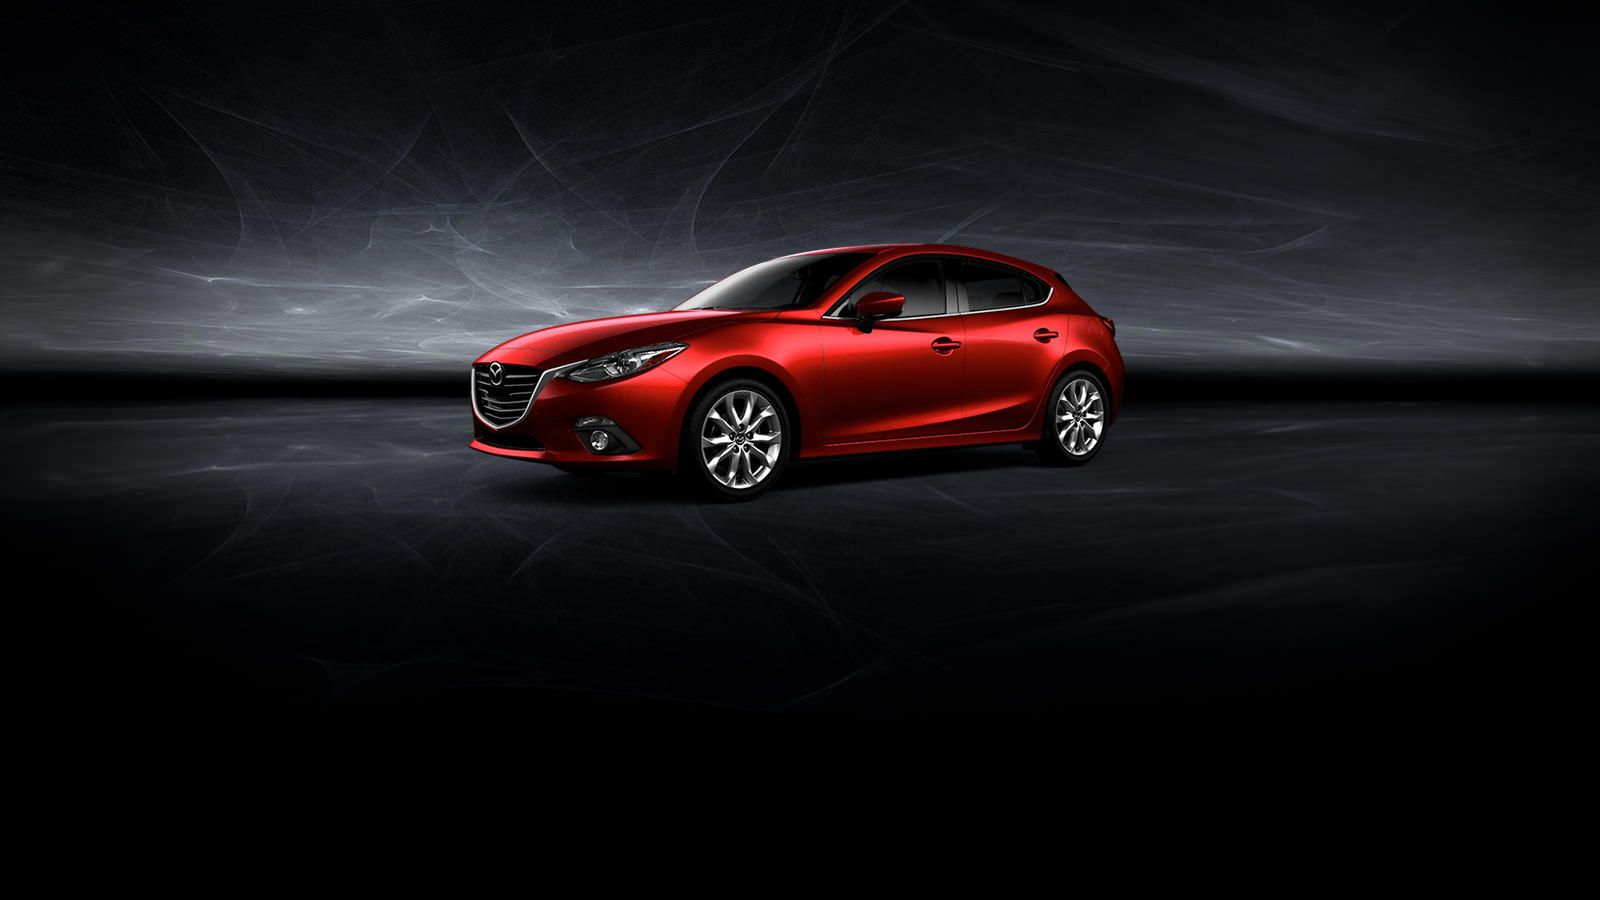 2014 Mazda 3 Hatchback Fuel Efficient Compact Car